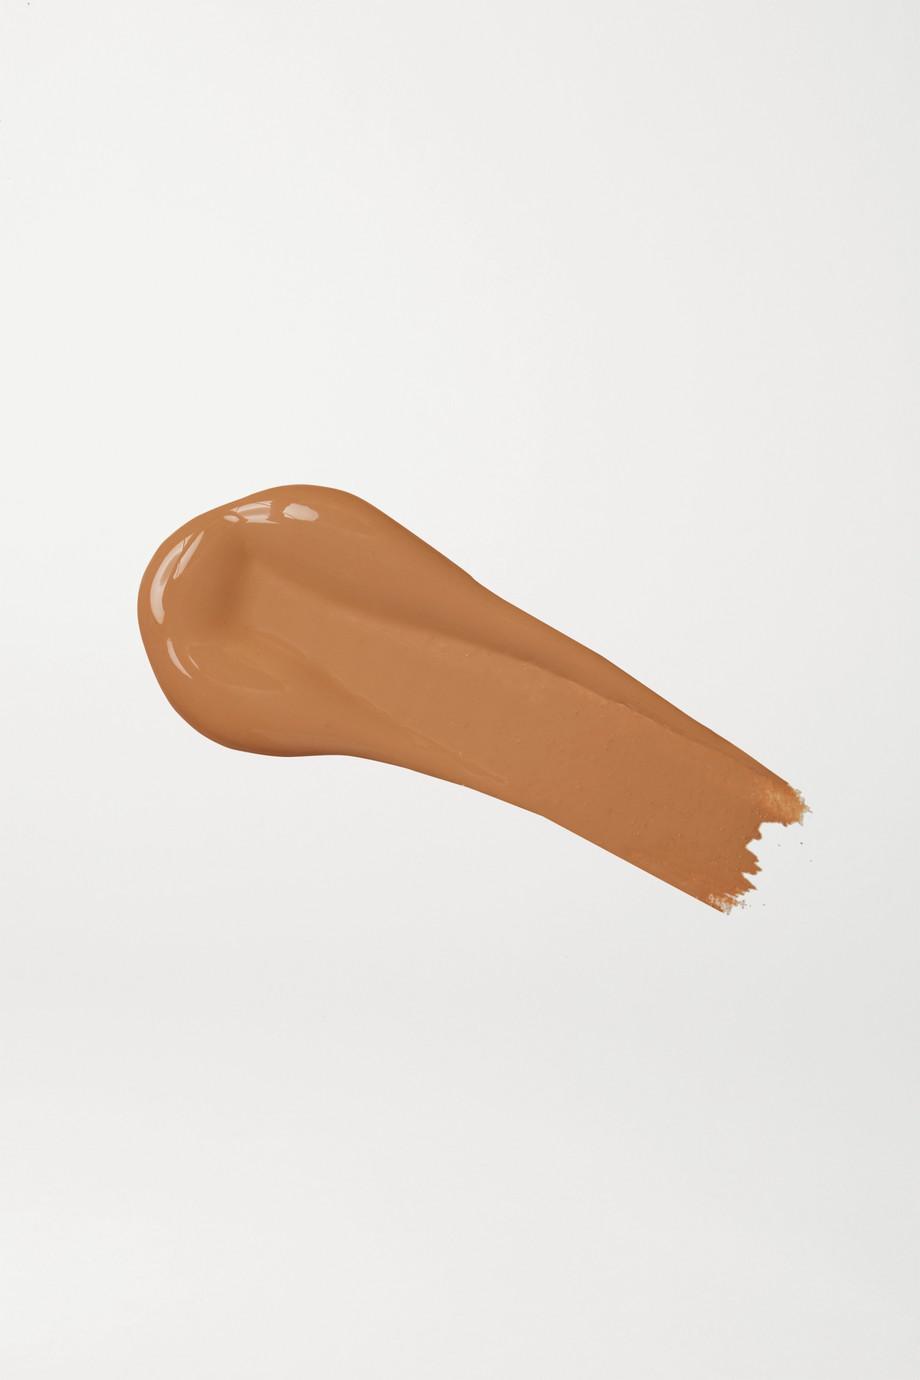 Kosas Revealer Super Creamy + Brightening Concealer - 6.8